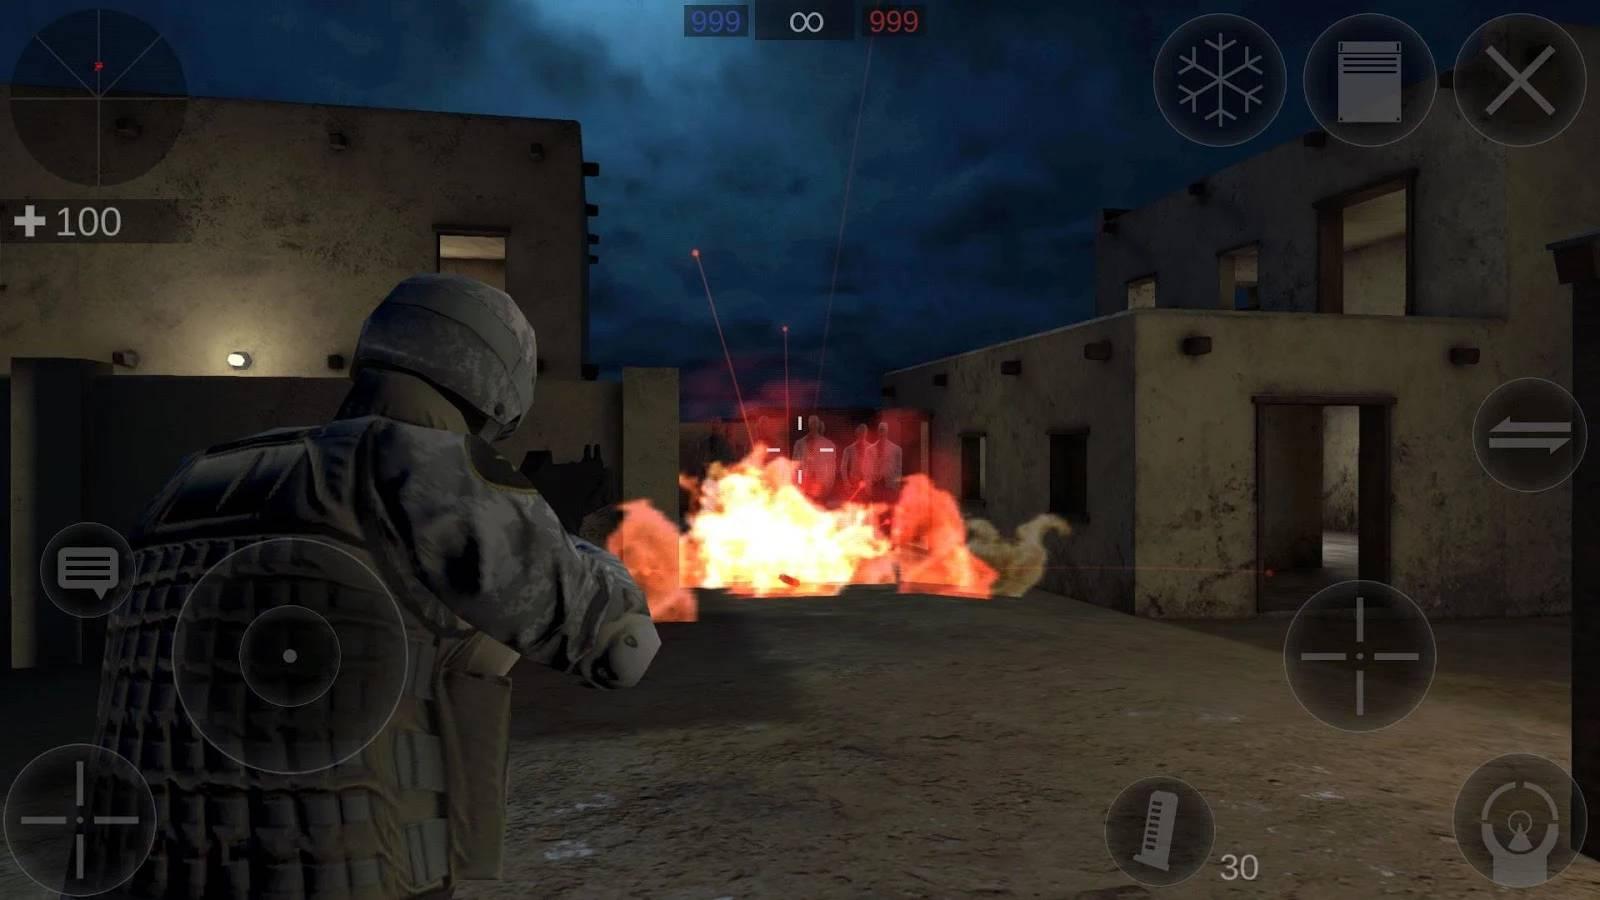 Android Oyun Evrenim Zombie Combat Simulator V1 2 8 Mod Apk